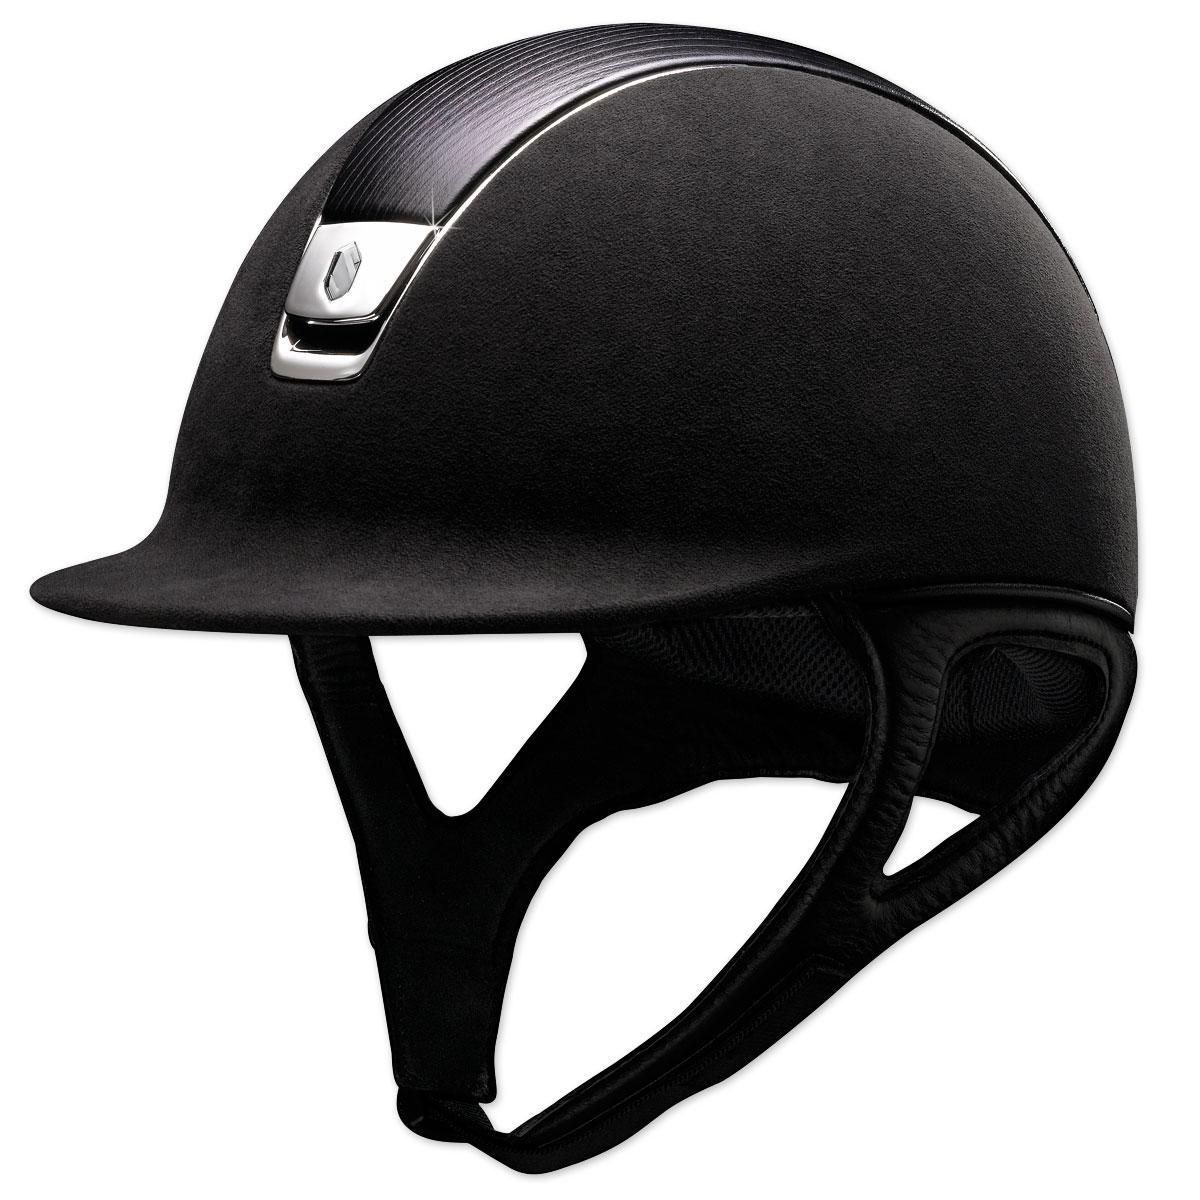 Samshield Premium Helmet